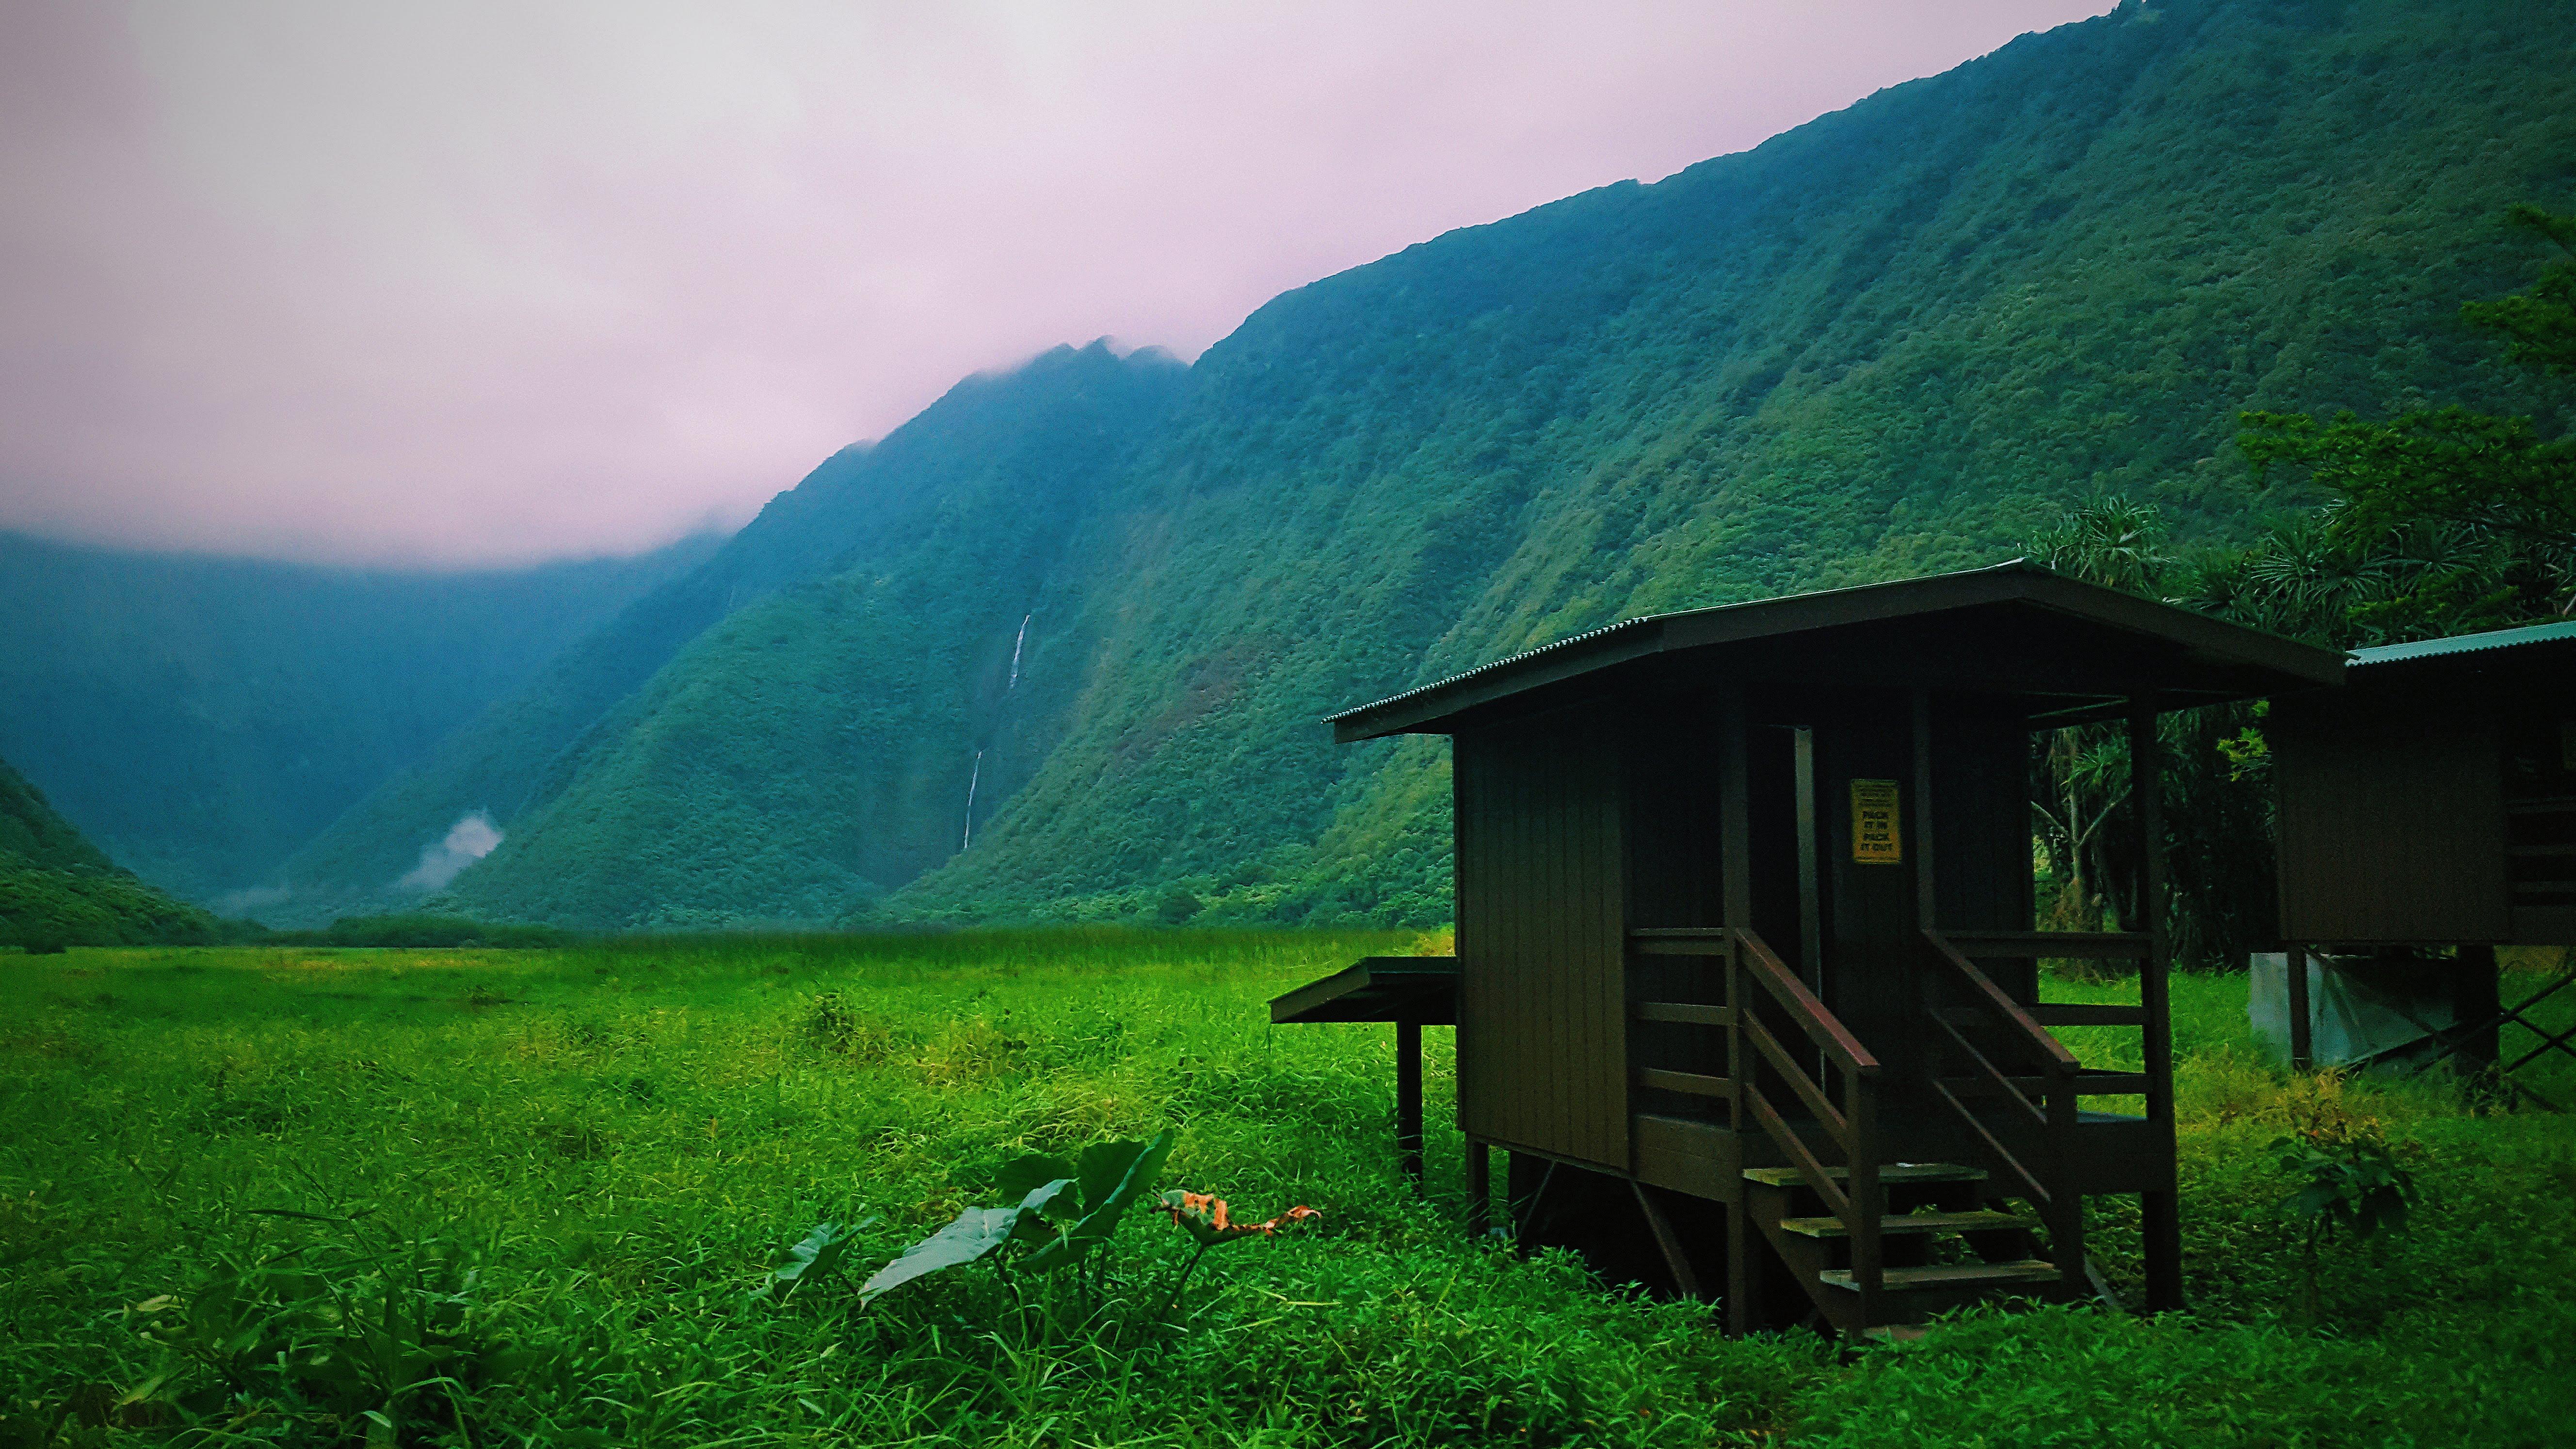 Outhouse in Waipio Valley